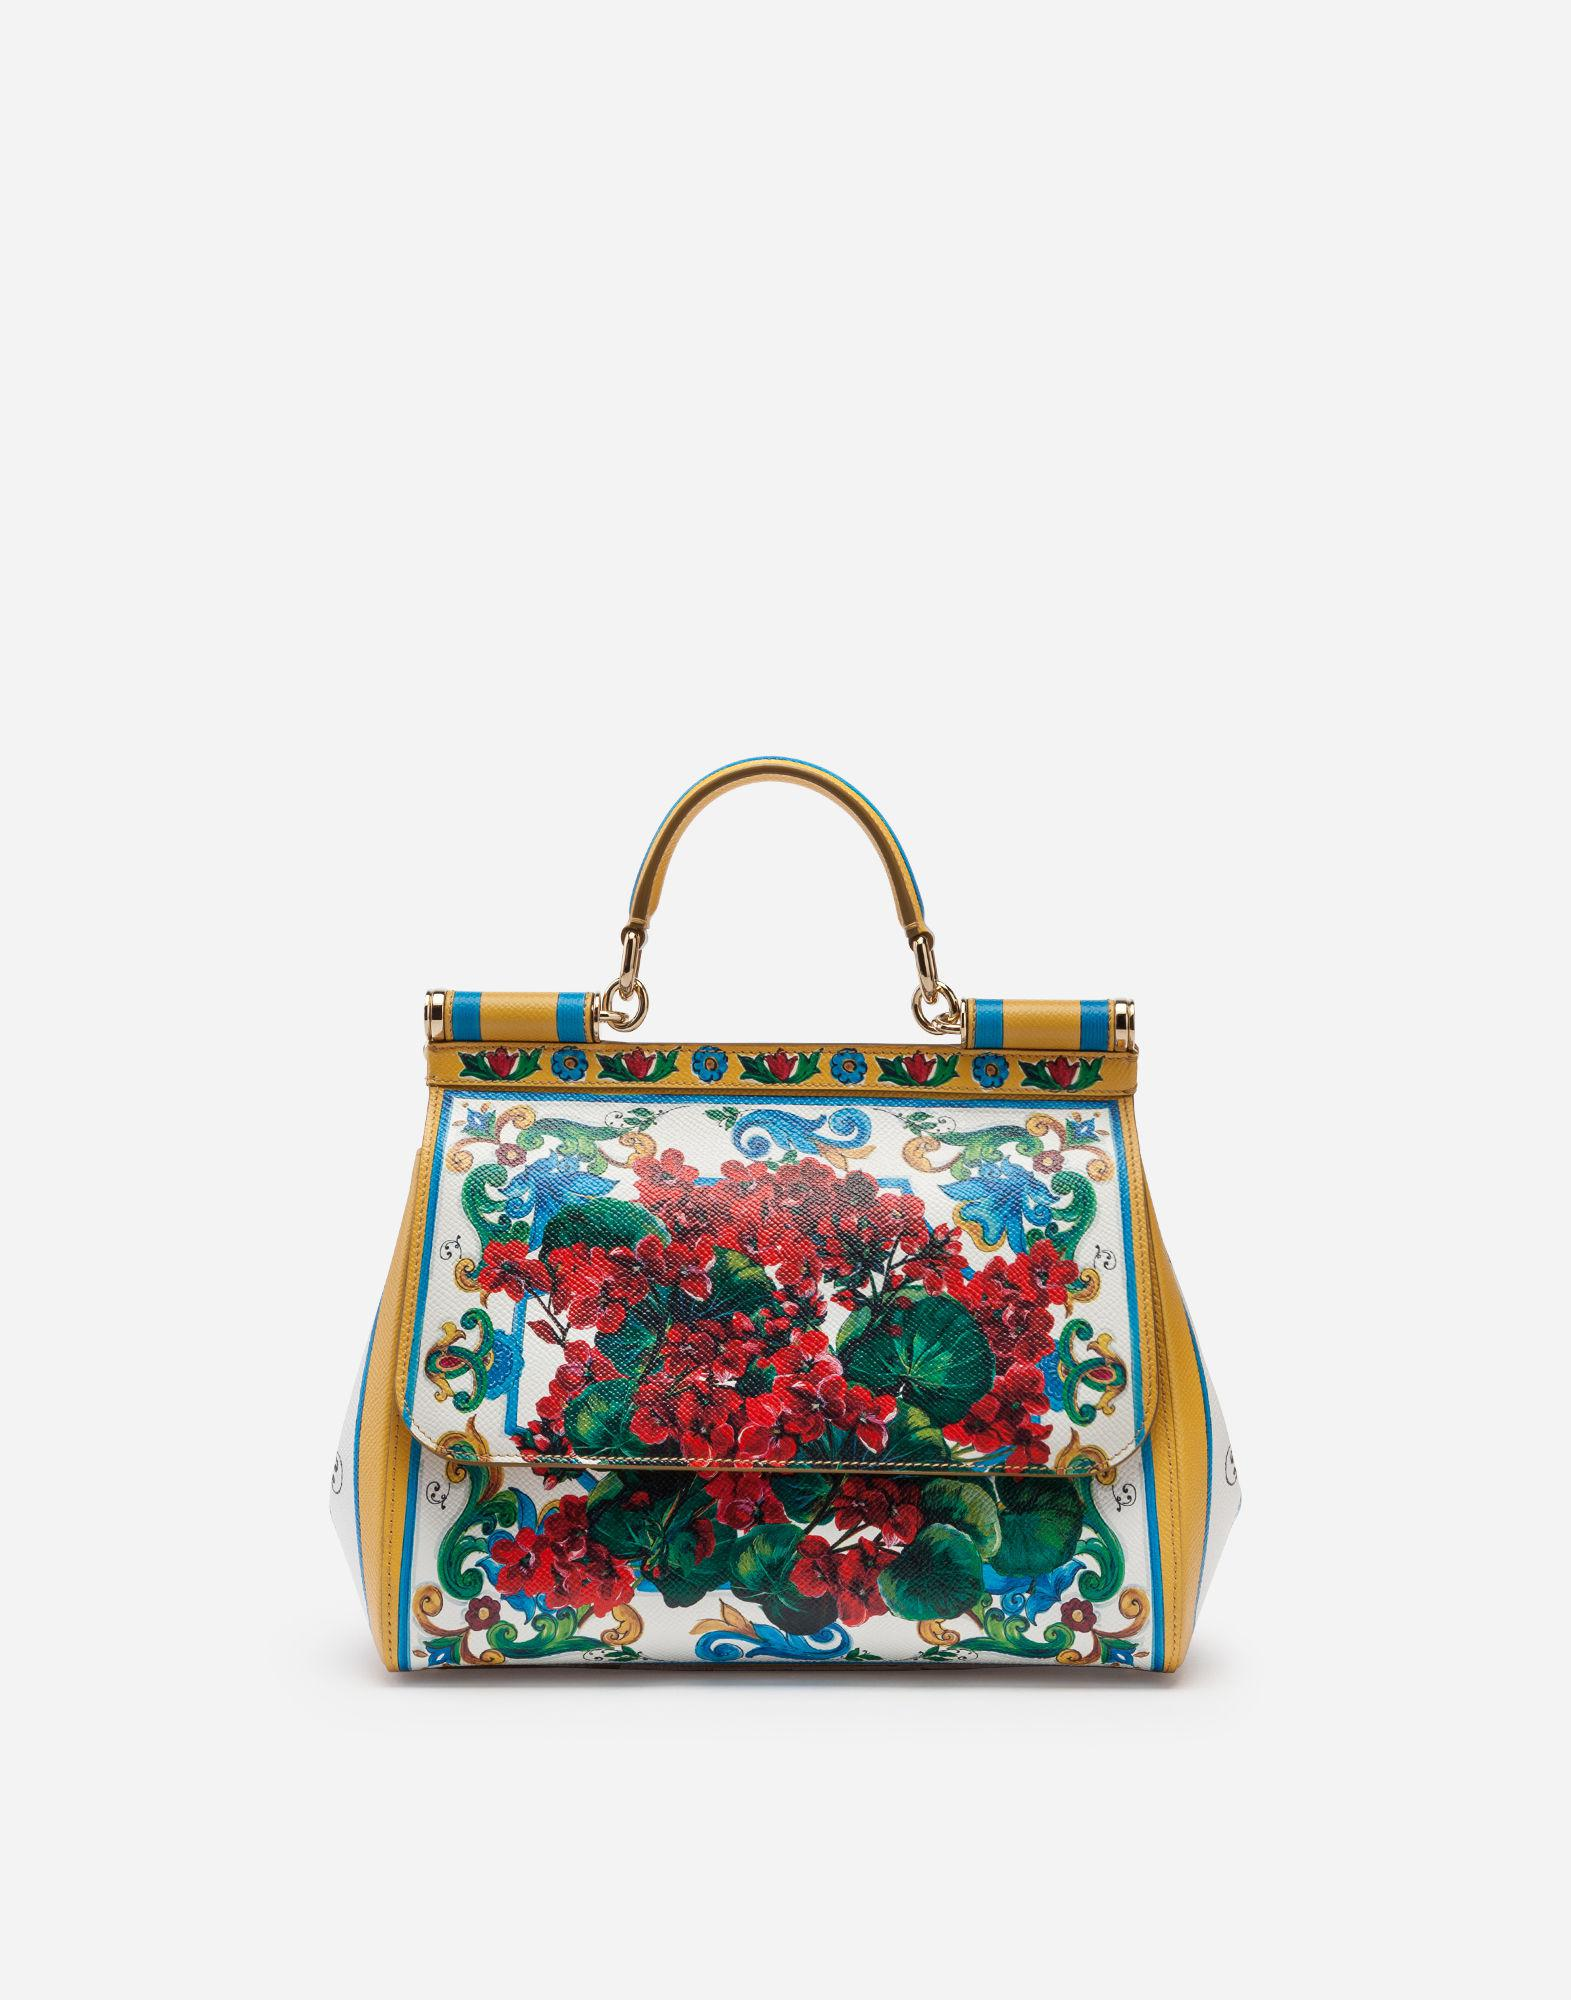 317cd605e860 Lyst - Dolce   Gabbana Medium Sicily Bag In Printed Dauphine Calfskin